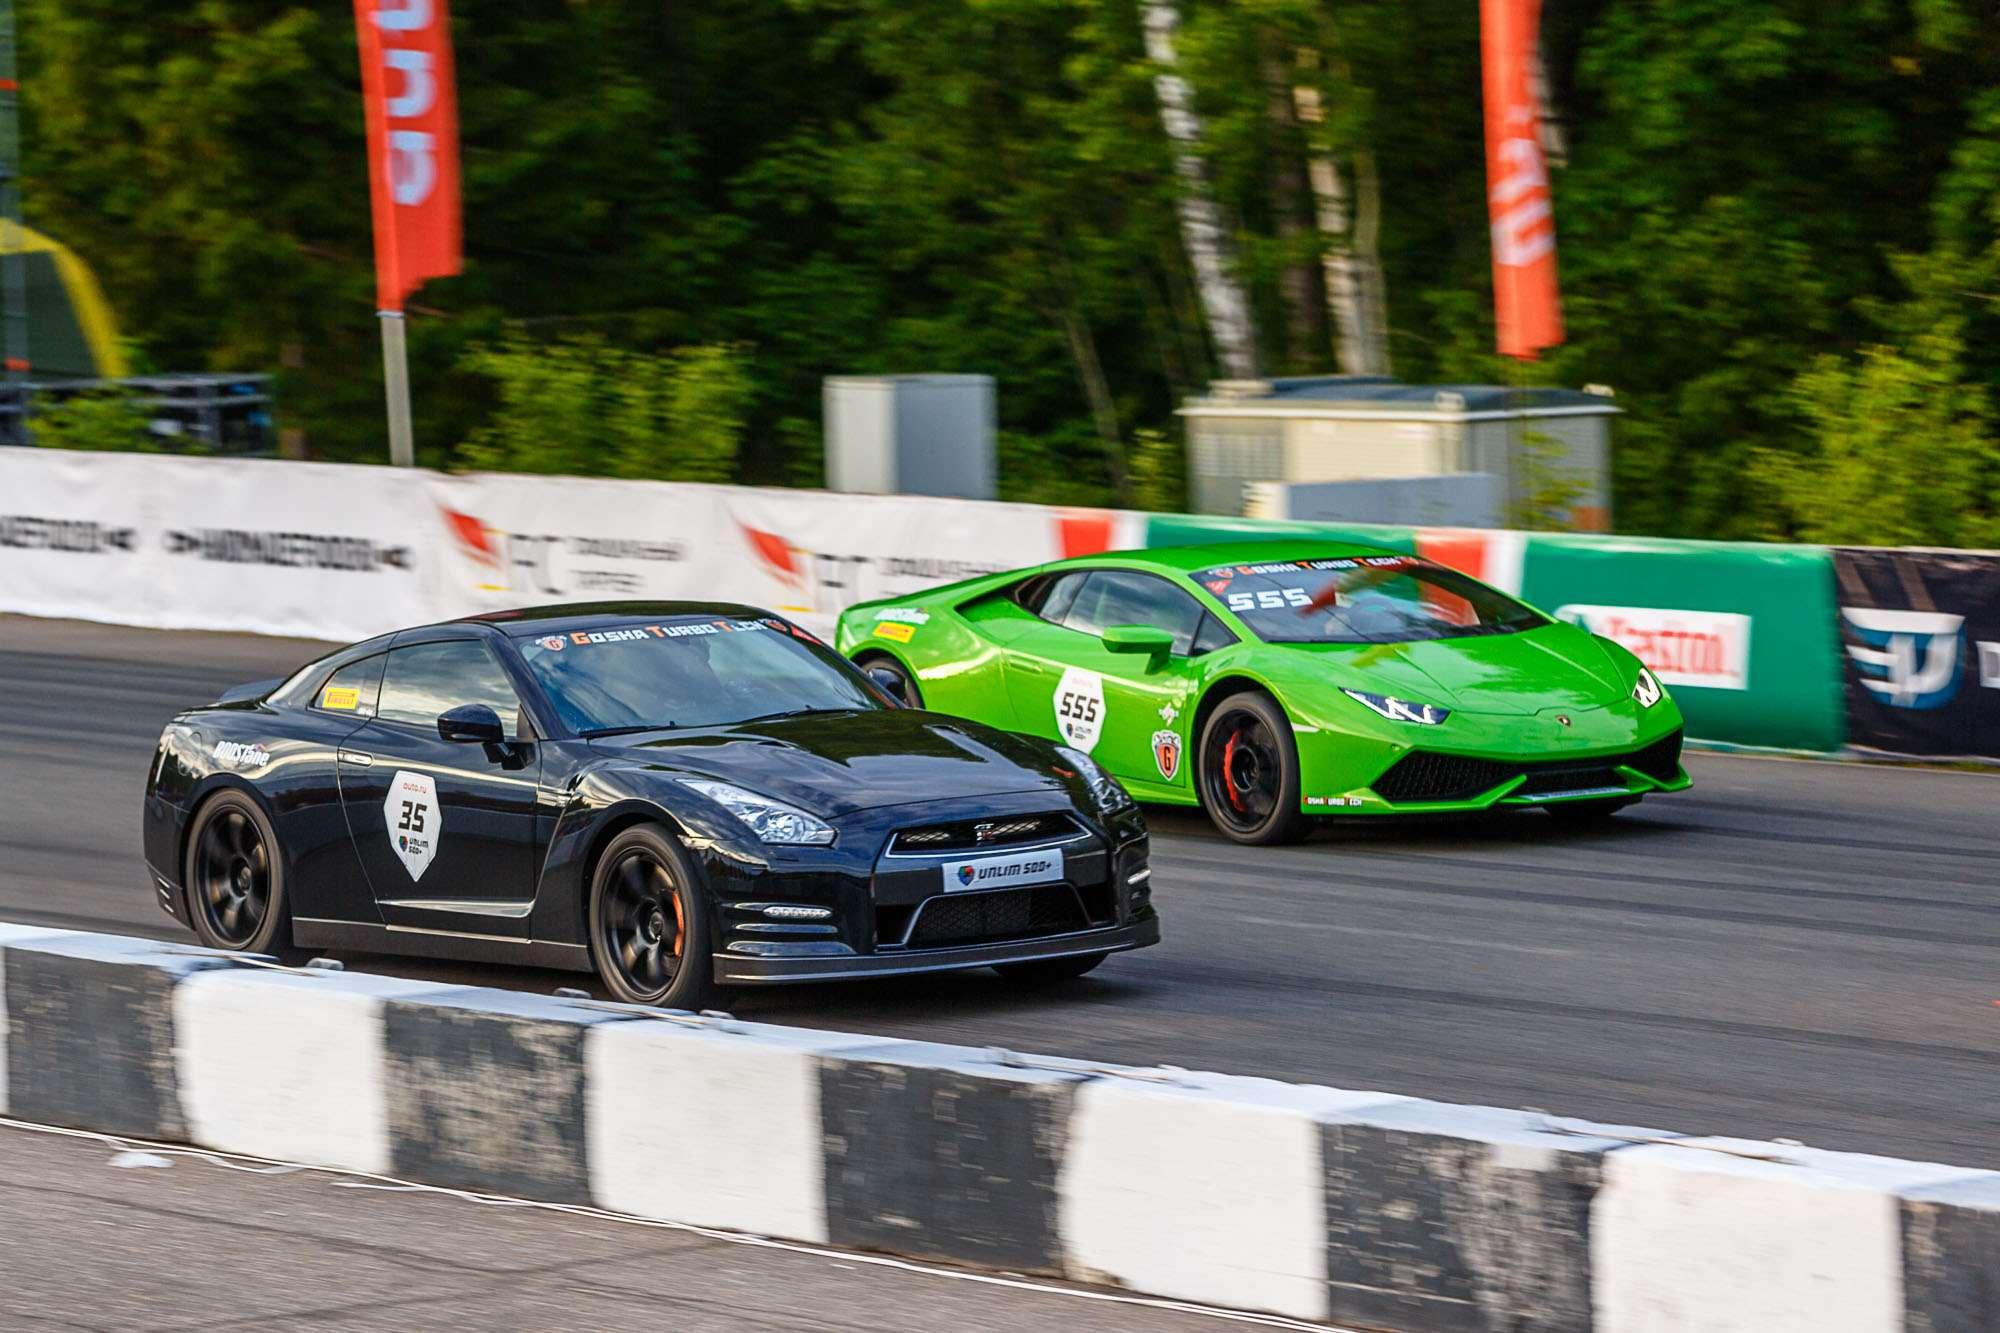 Unlim 500+ вфотографиях: Lamborghini Huracan, BMW M6и ВАЗ 2102